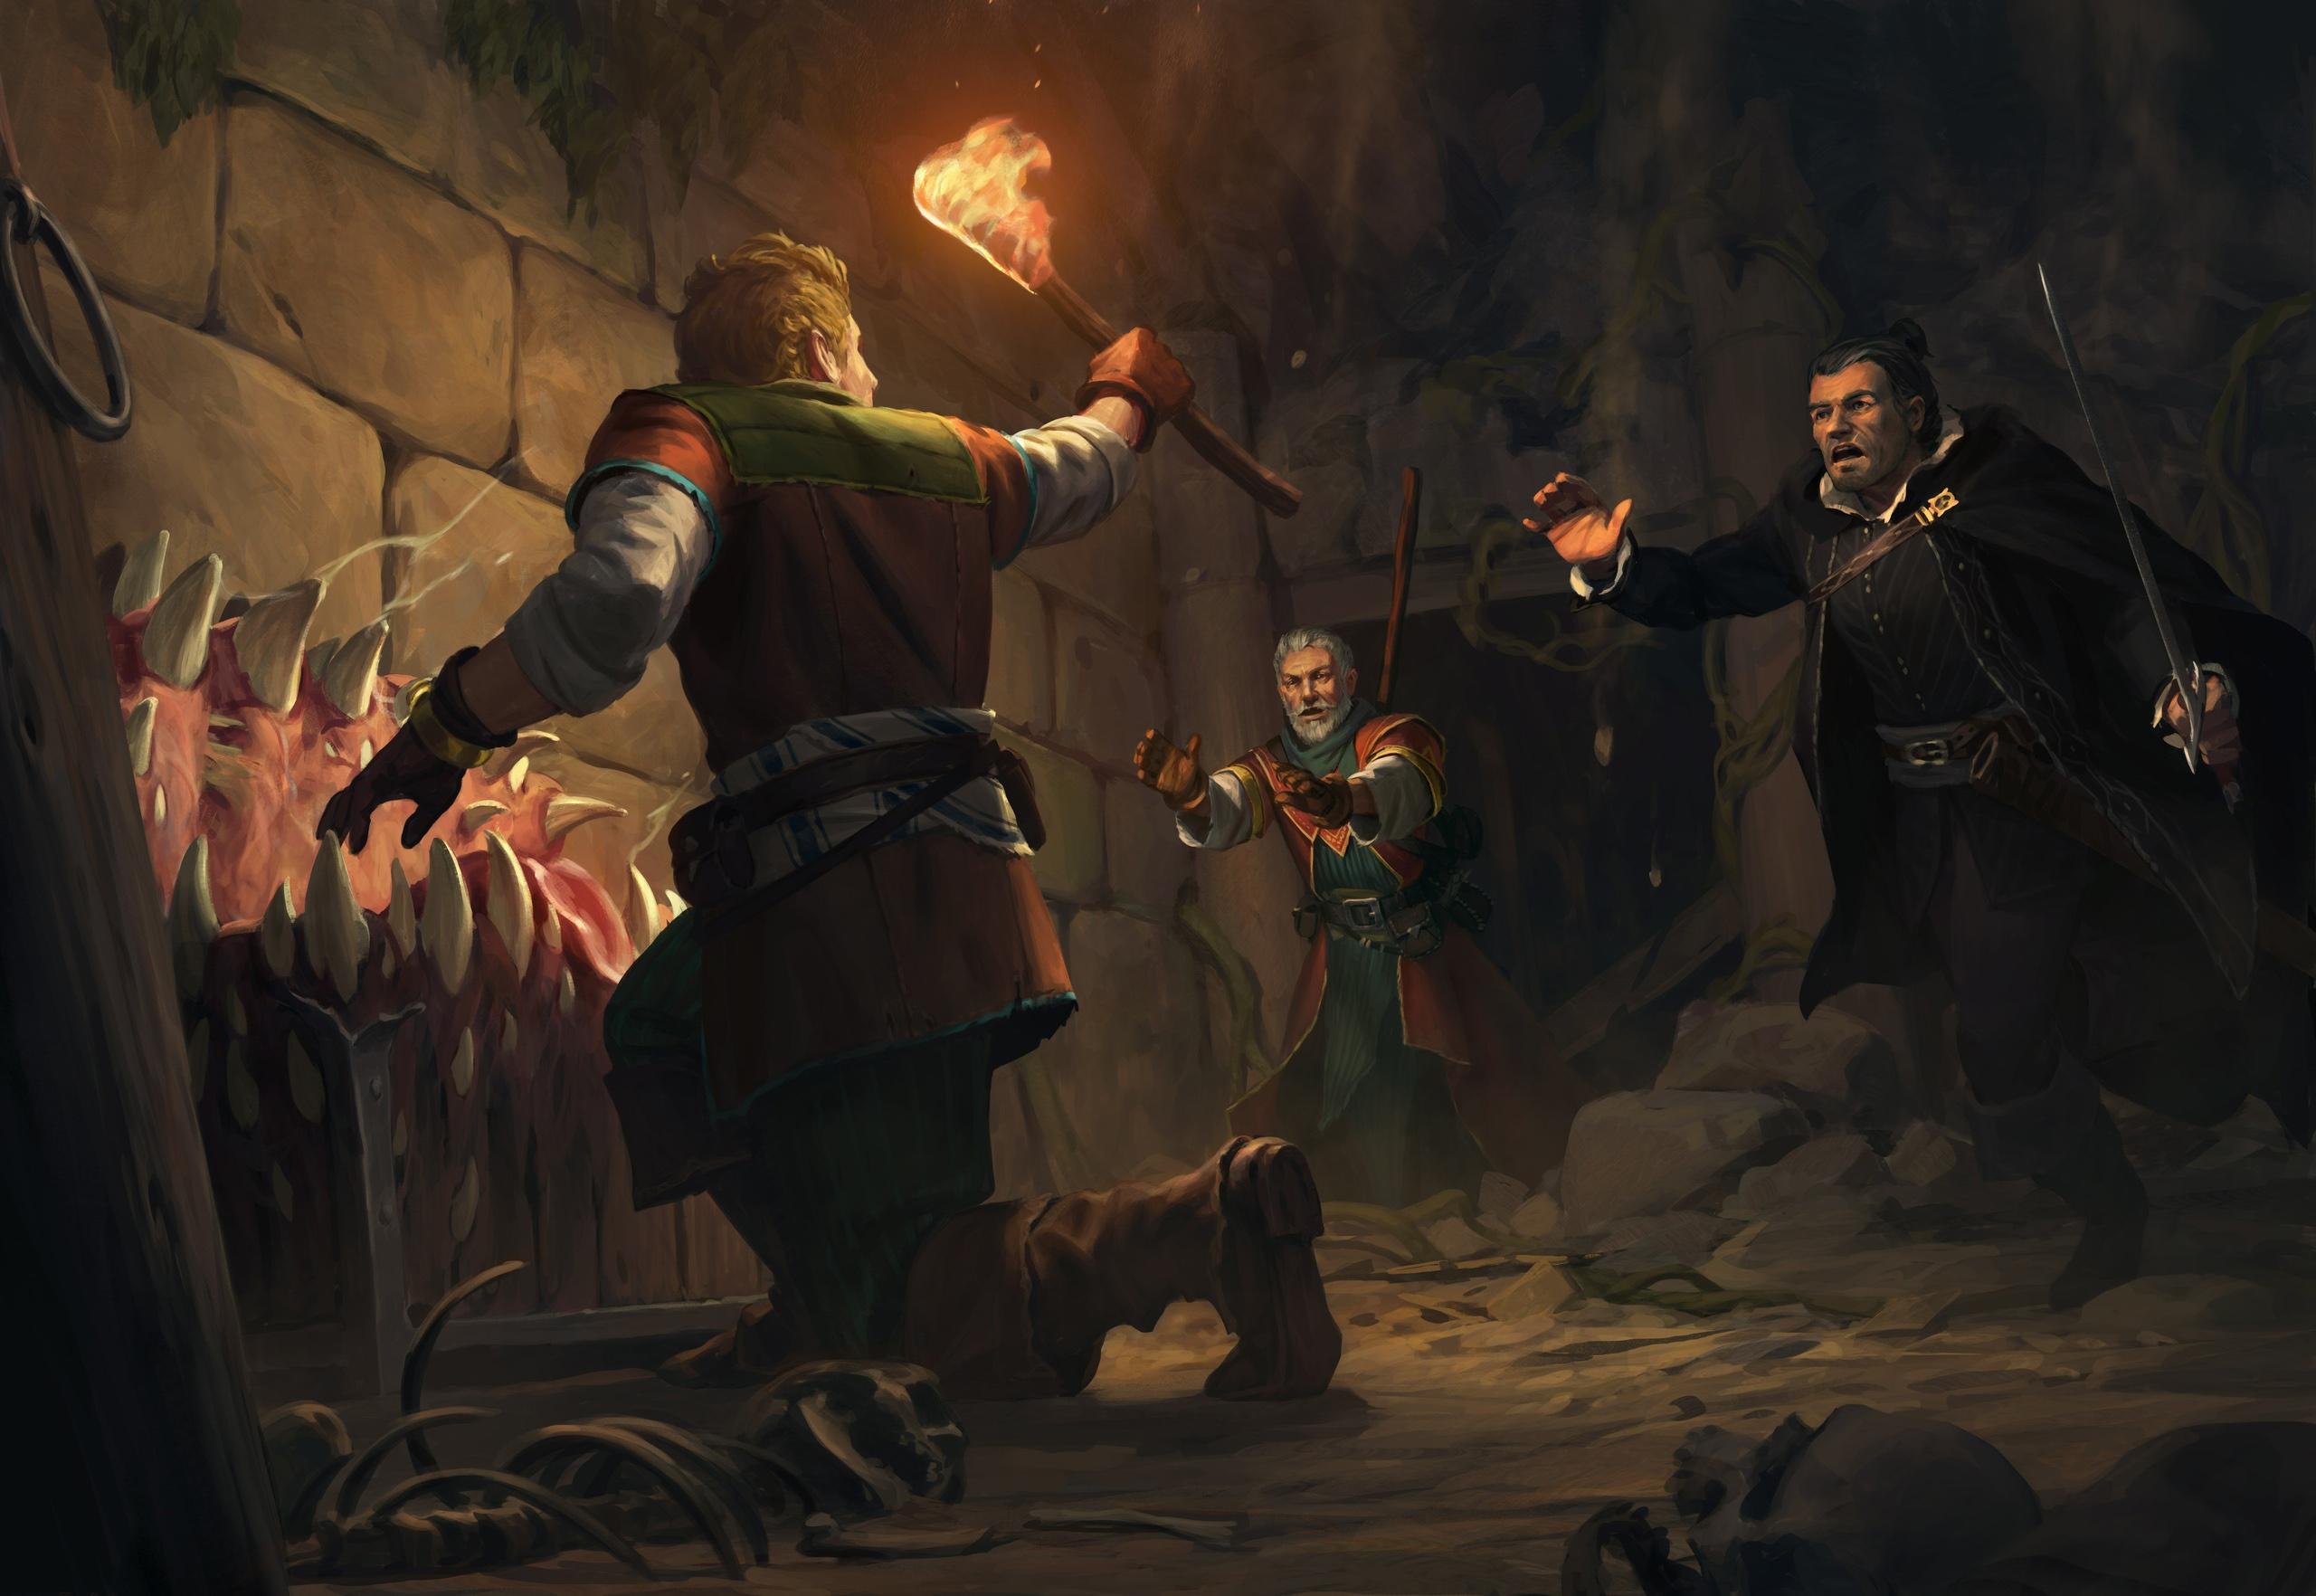 Pathfinder: Kingmaker - Varnhold's Lot DLC Releases This